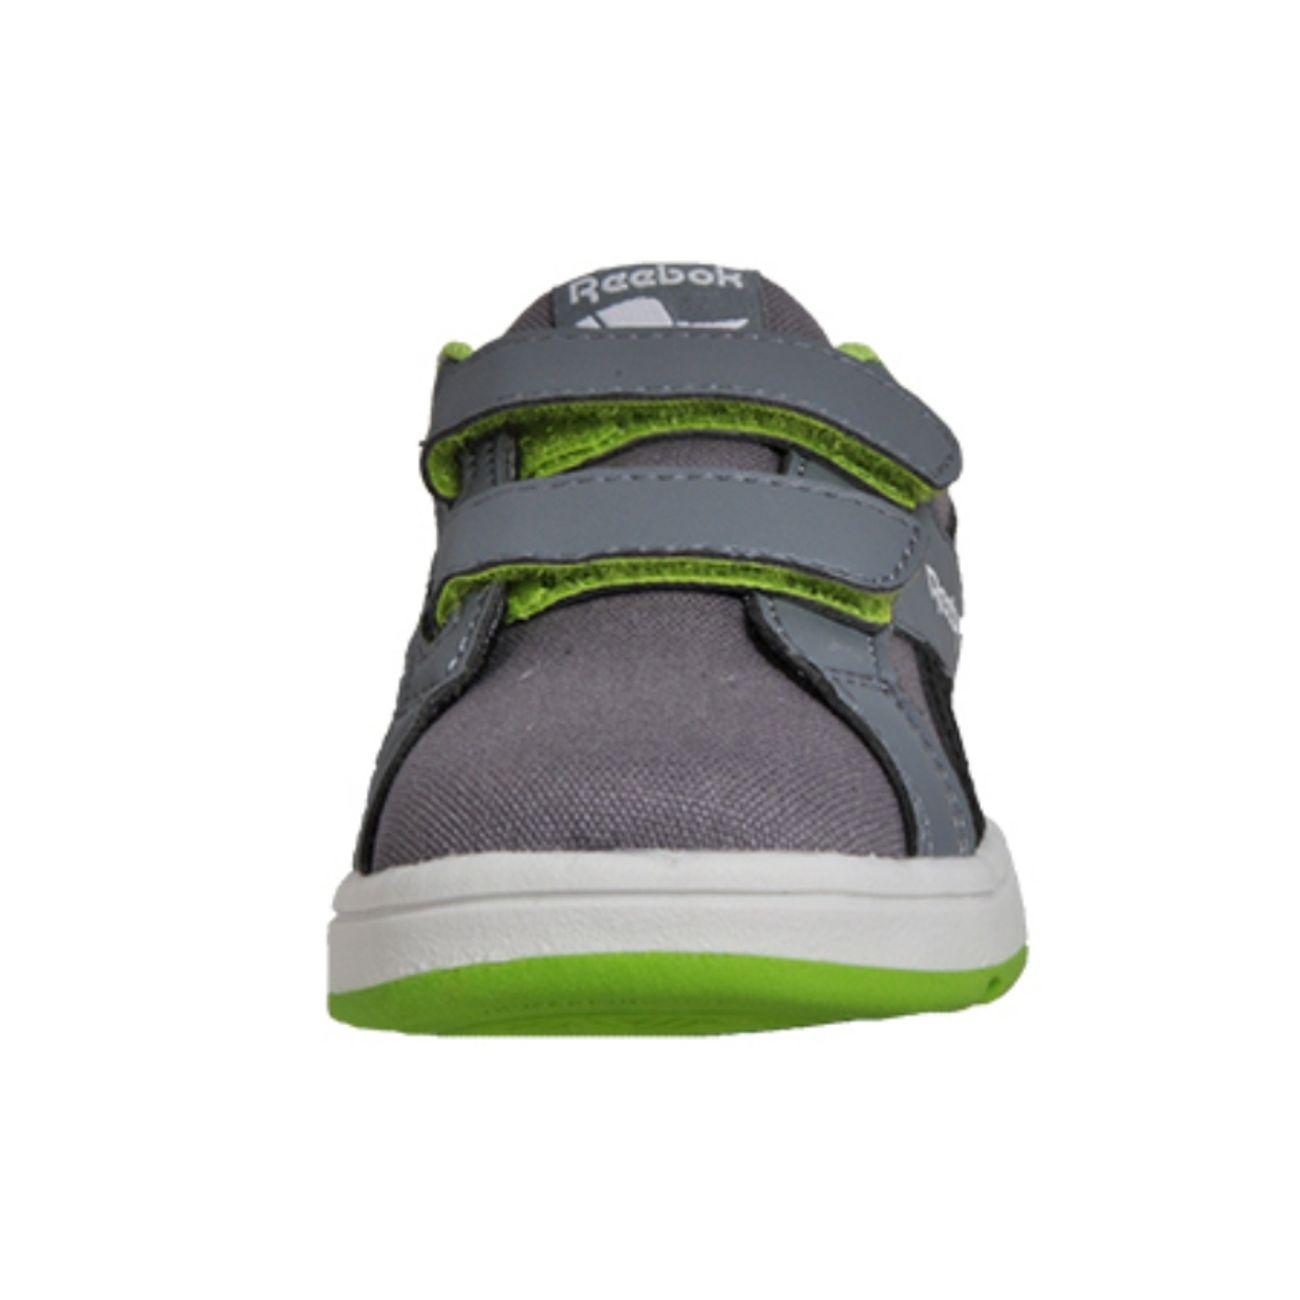 L2v Royal Chaussures Reebok En Comp Cvs Enfants Baskets qSpLGVUMz